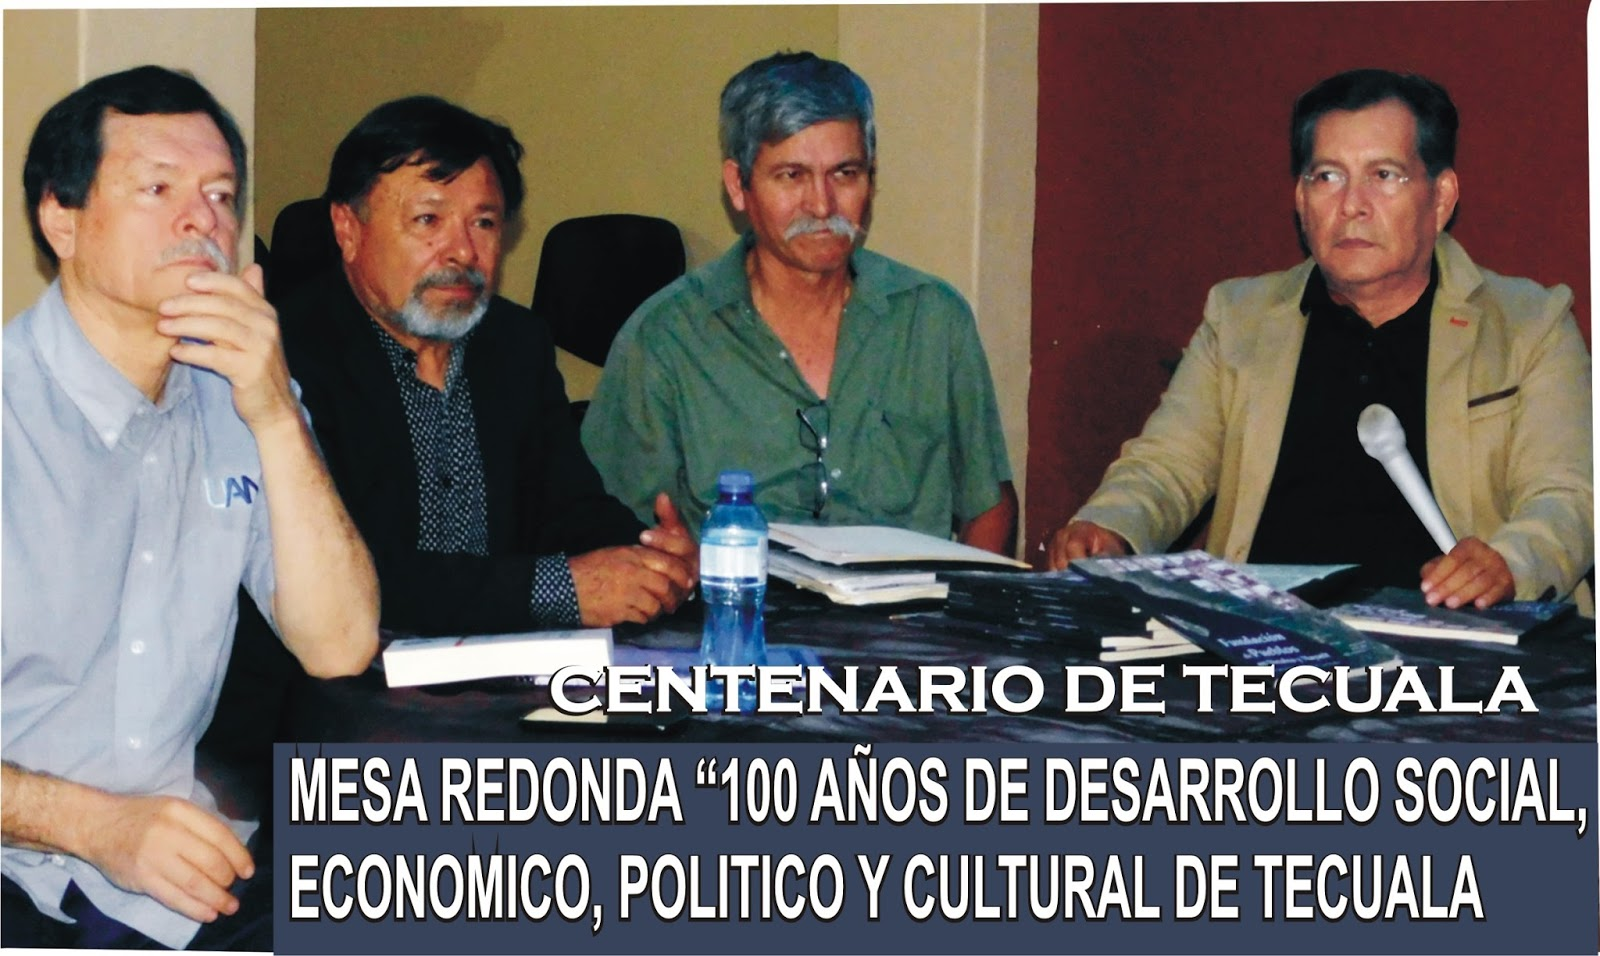 TECUALA SU HISTORIA | HISTORIA DE TECUALA